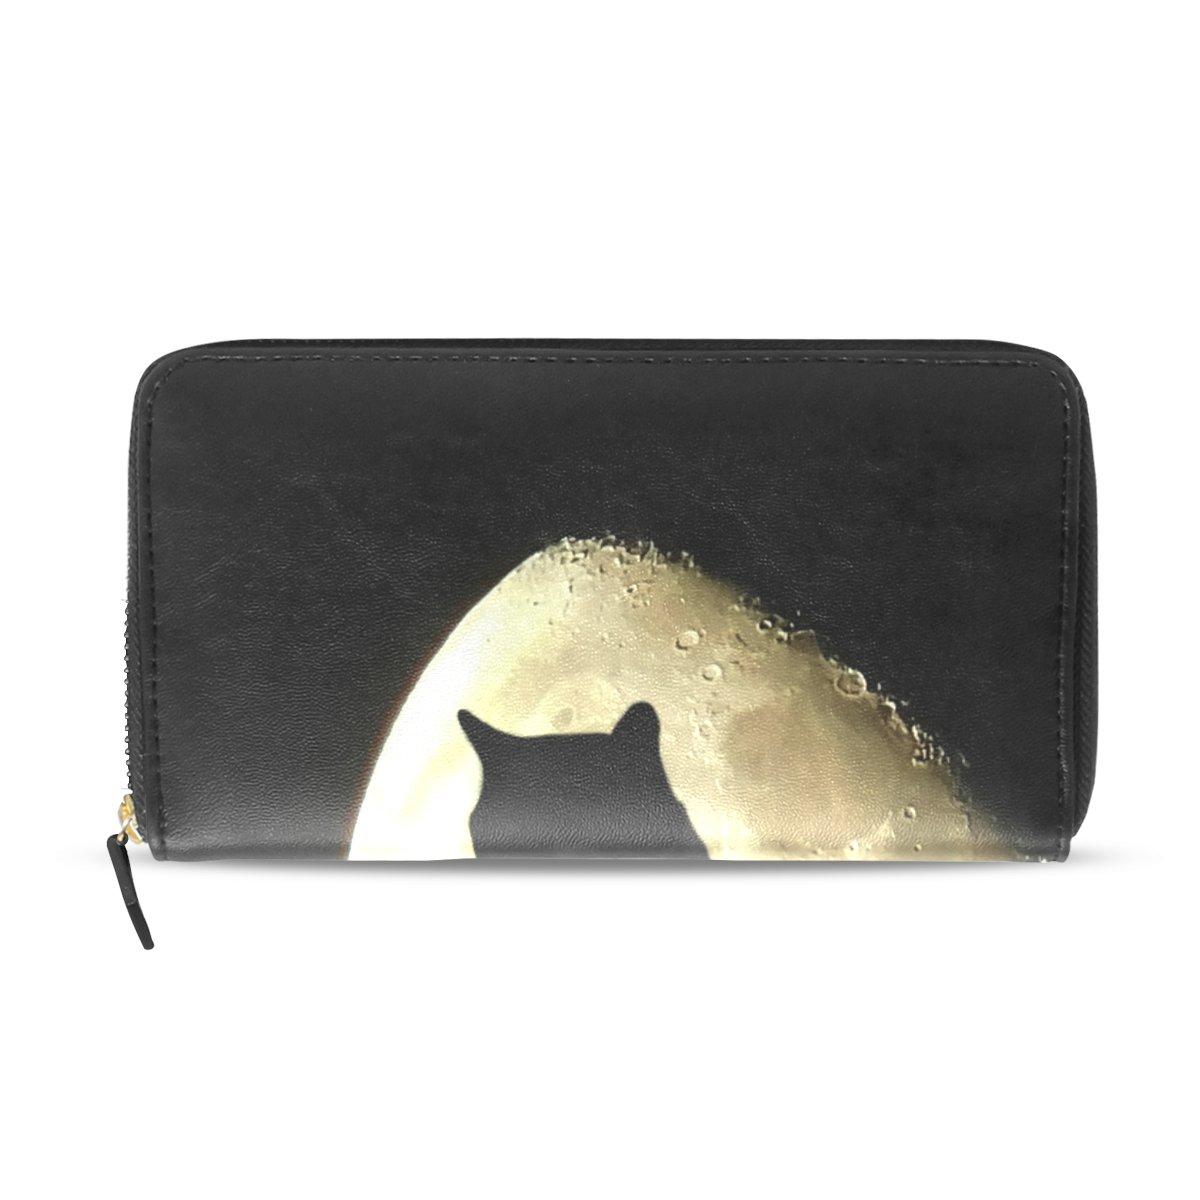 ea8f66061ed9 Womens Zipper Wallet Halloween Black Cat Moonlight Clutch Purse Card ...